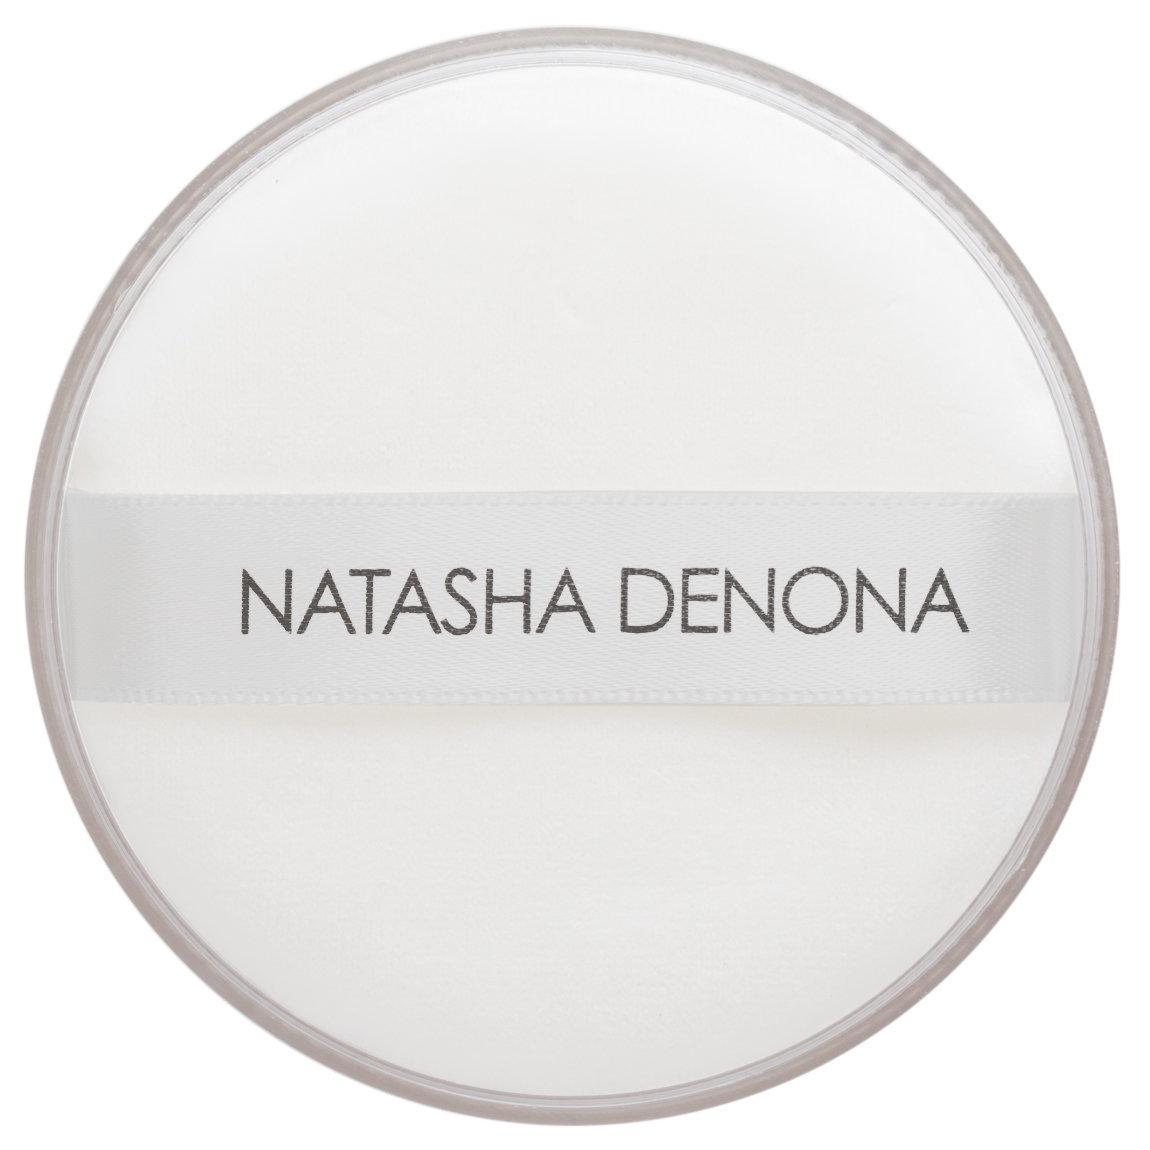 Natasha Denona Baby Puff alternative view 1 - product swatch.